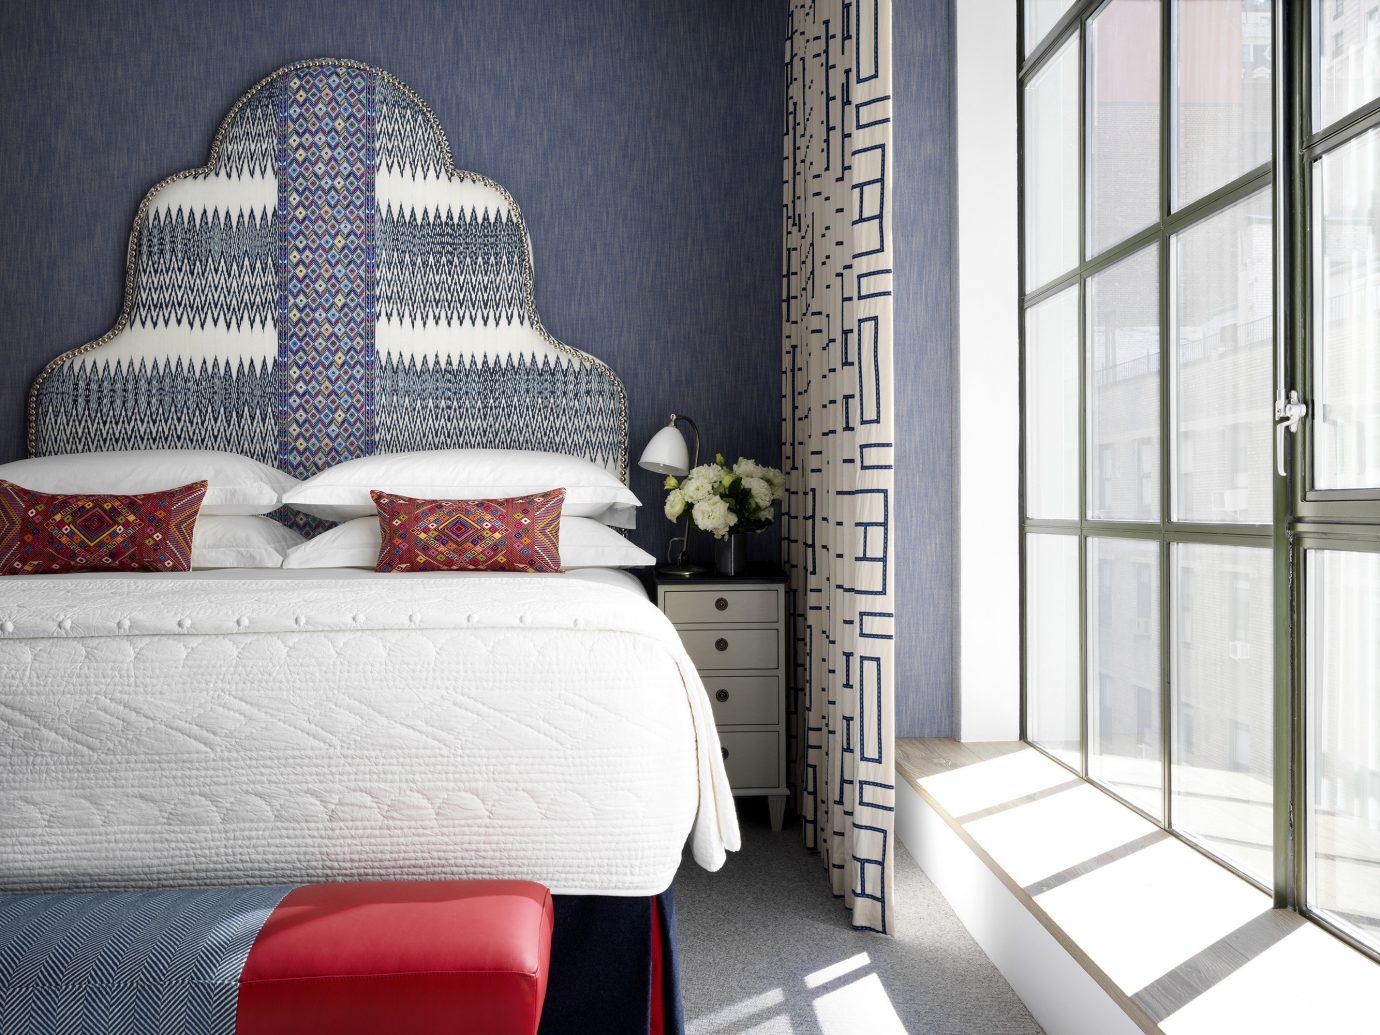 Hotels Travel Shop room interior design wall home furniture window bed frame bed Bedroom floor window covering pattern flooring interior designer